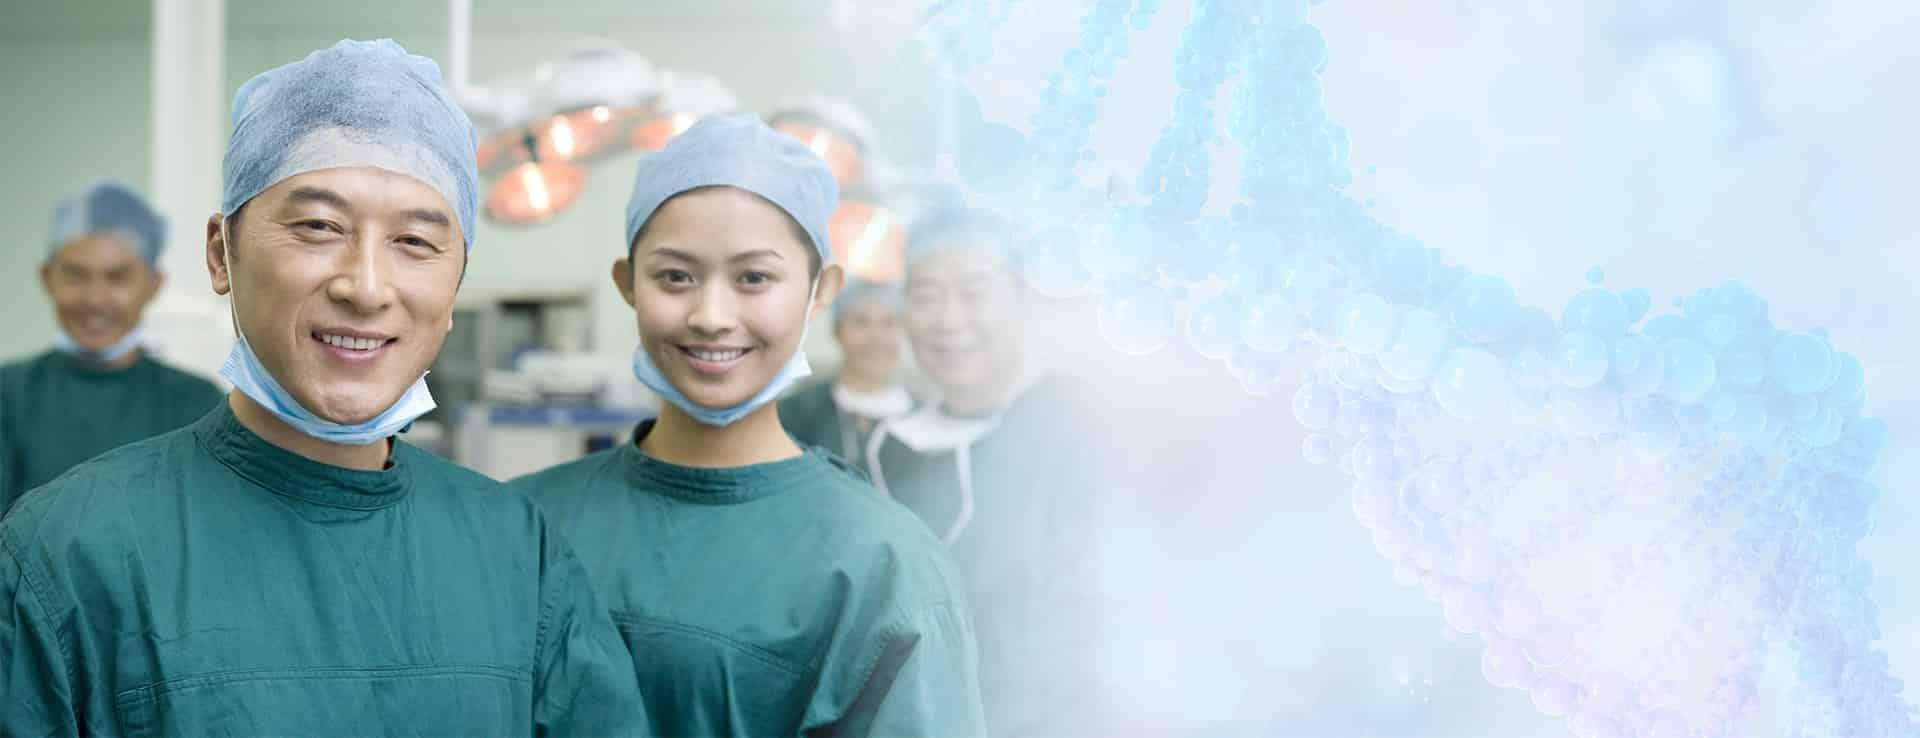 victormedic (@victormedic) Cover Image